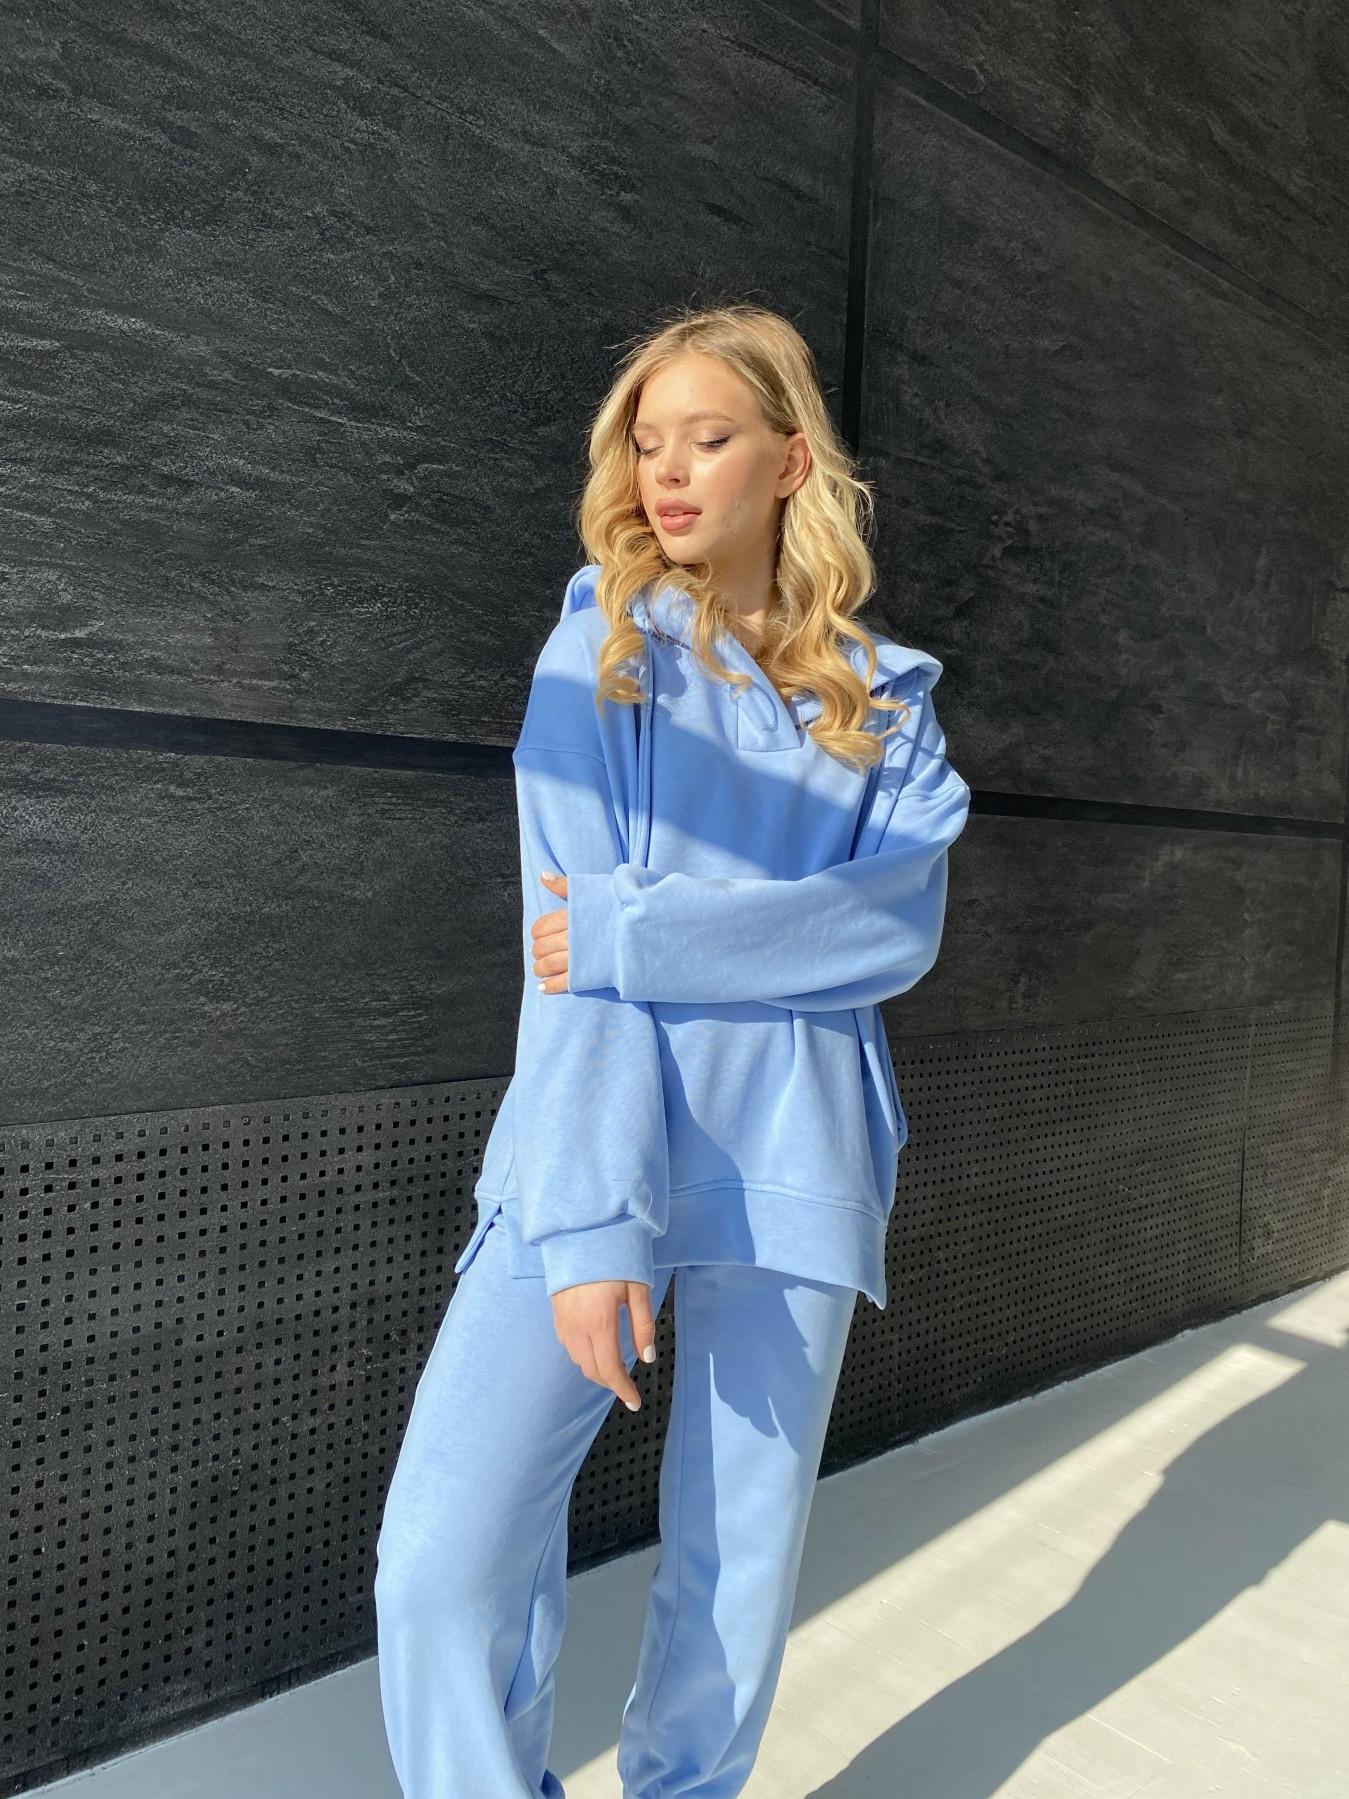 Ярис костюм из 3х нитки 10789 АРТ. 47260 Цвет: Голубой - фото 1, интернет магазин tm-modus.ru